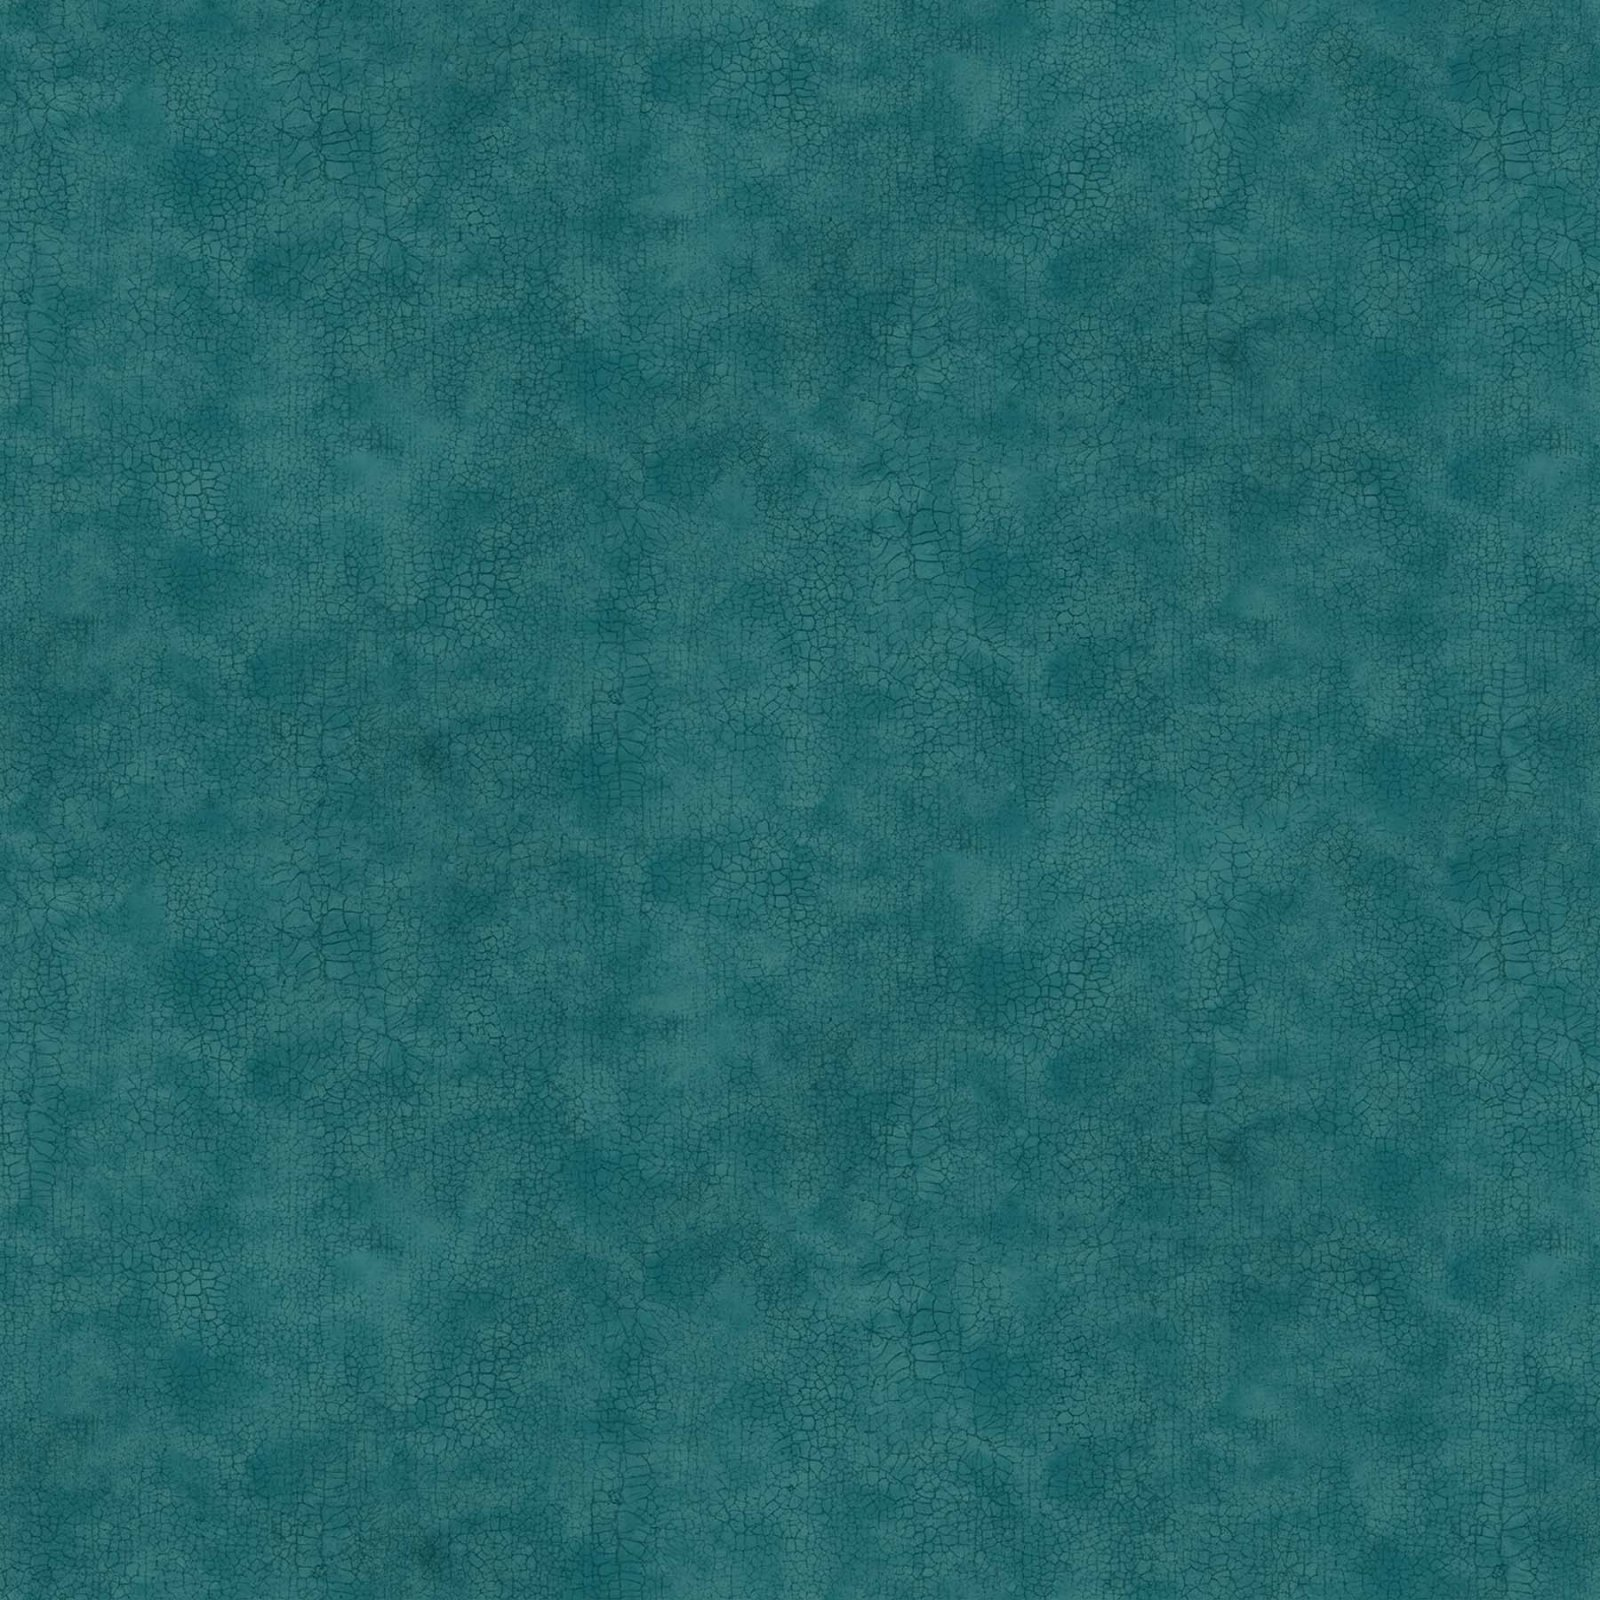 Northcott CRACKLE  9045-67 PEACOCK Textured Tonal